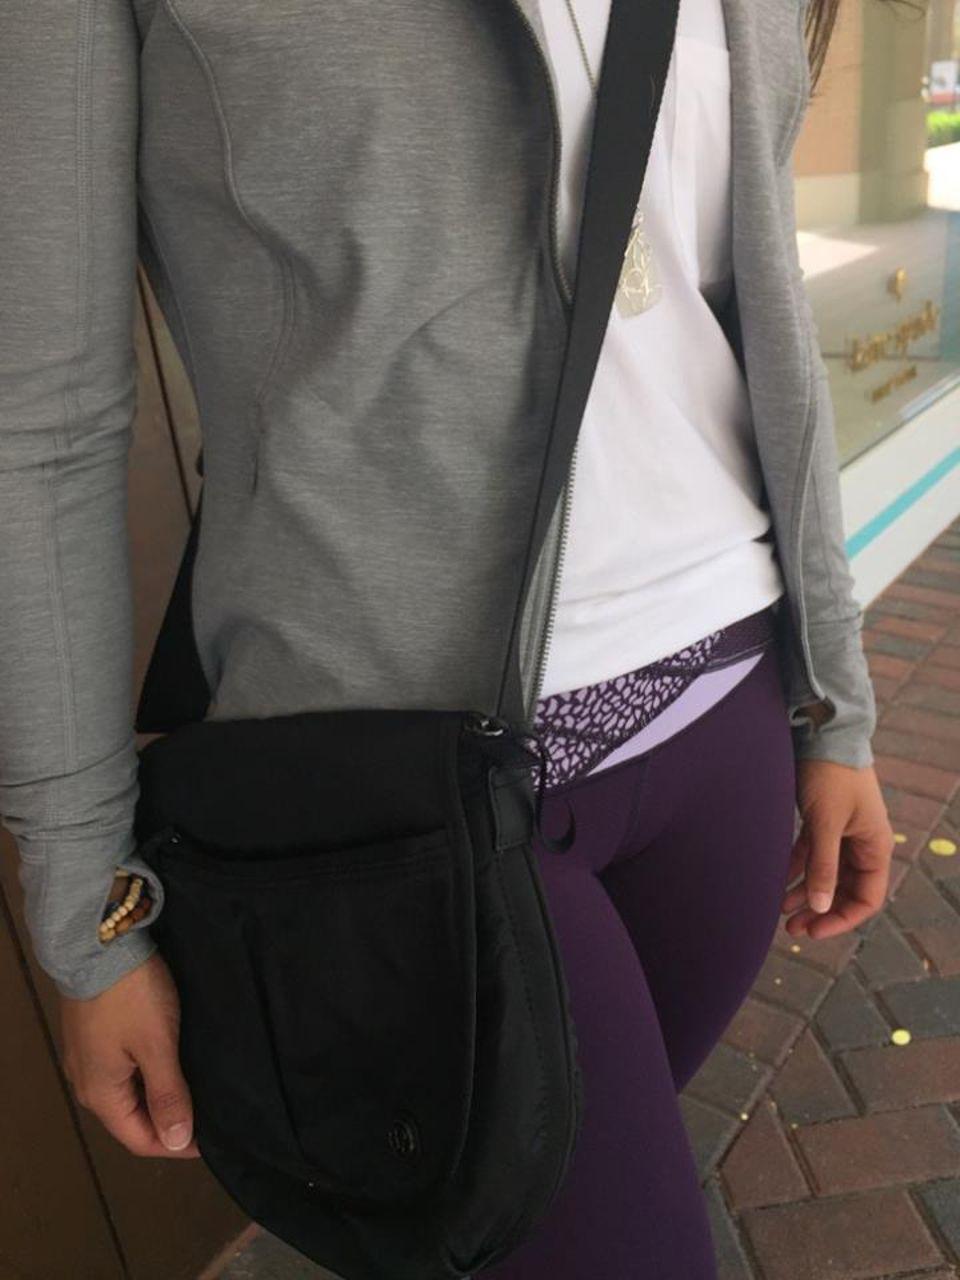 Lululemon Wunder Under Pant III - Deep Zinfandel / Lilac / Miss Mosaic Lilac Deep Zinfandel